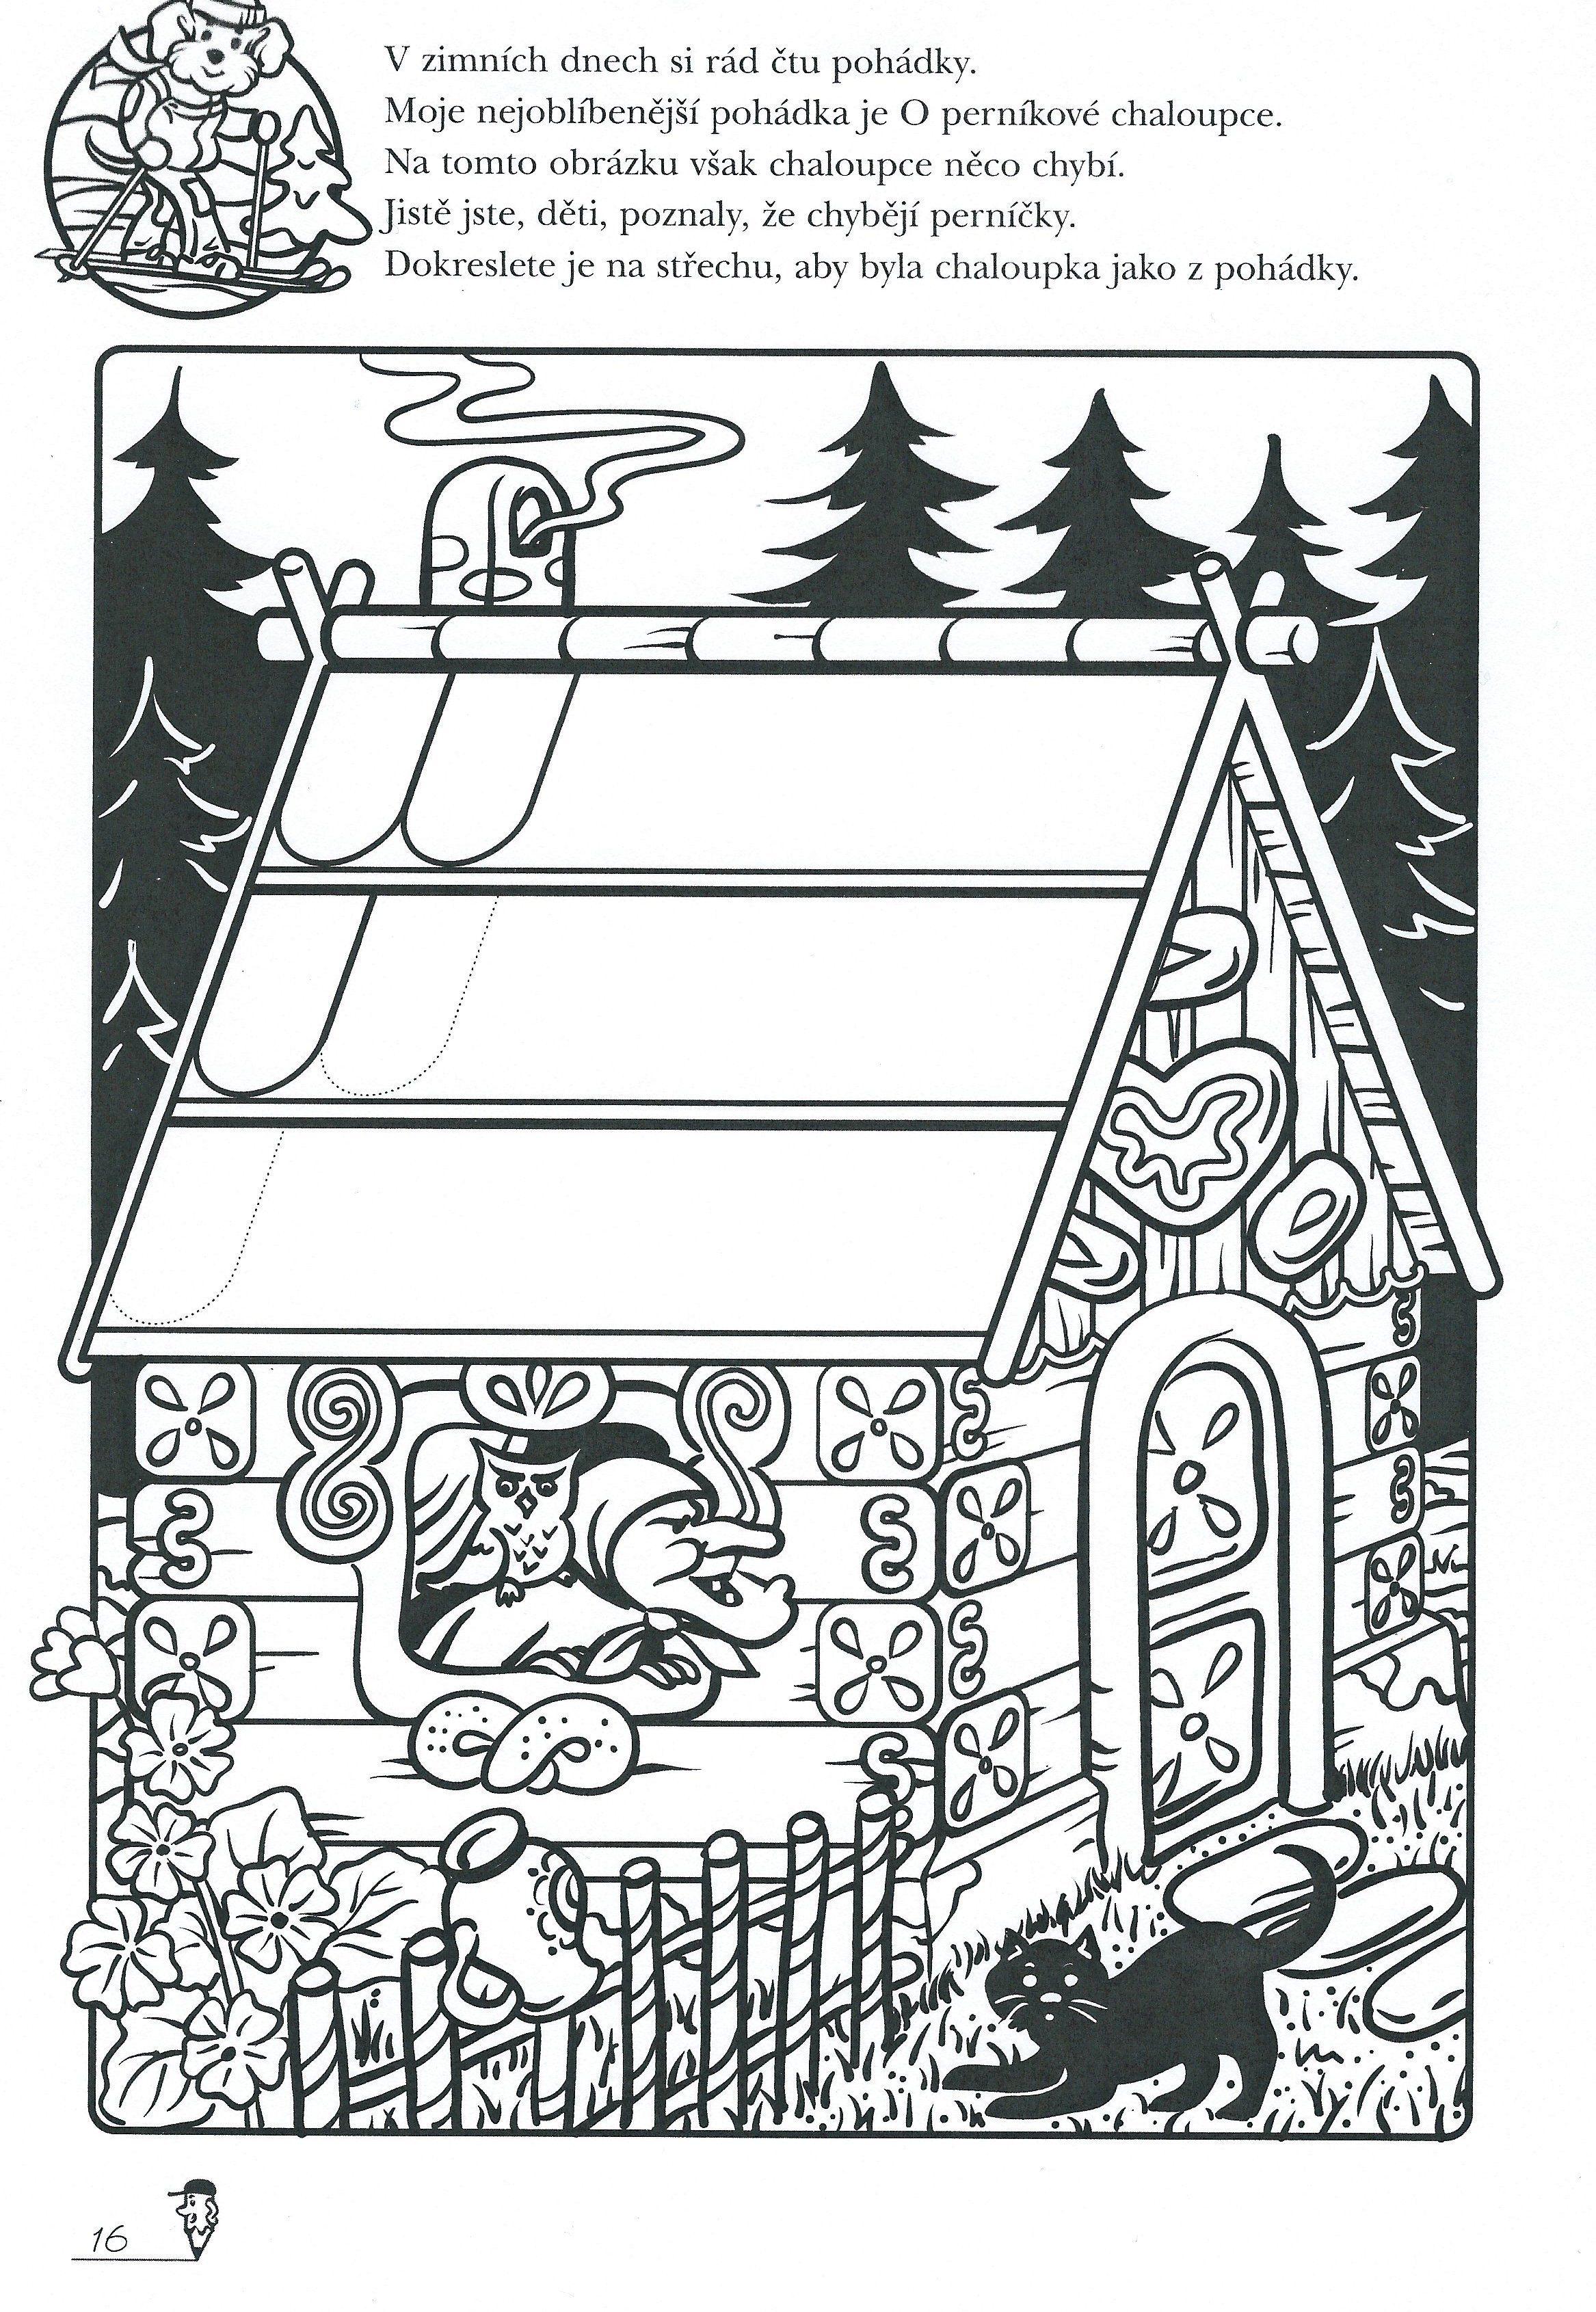 Pernikova Chaloupka Jpg 2 334 3 381 Pixelu Fairy Tales Nursery Rhymes Class Activities